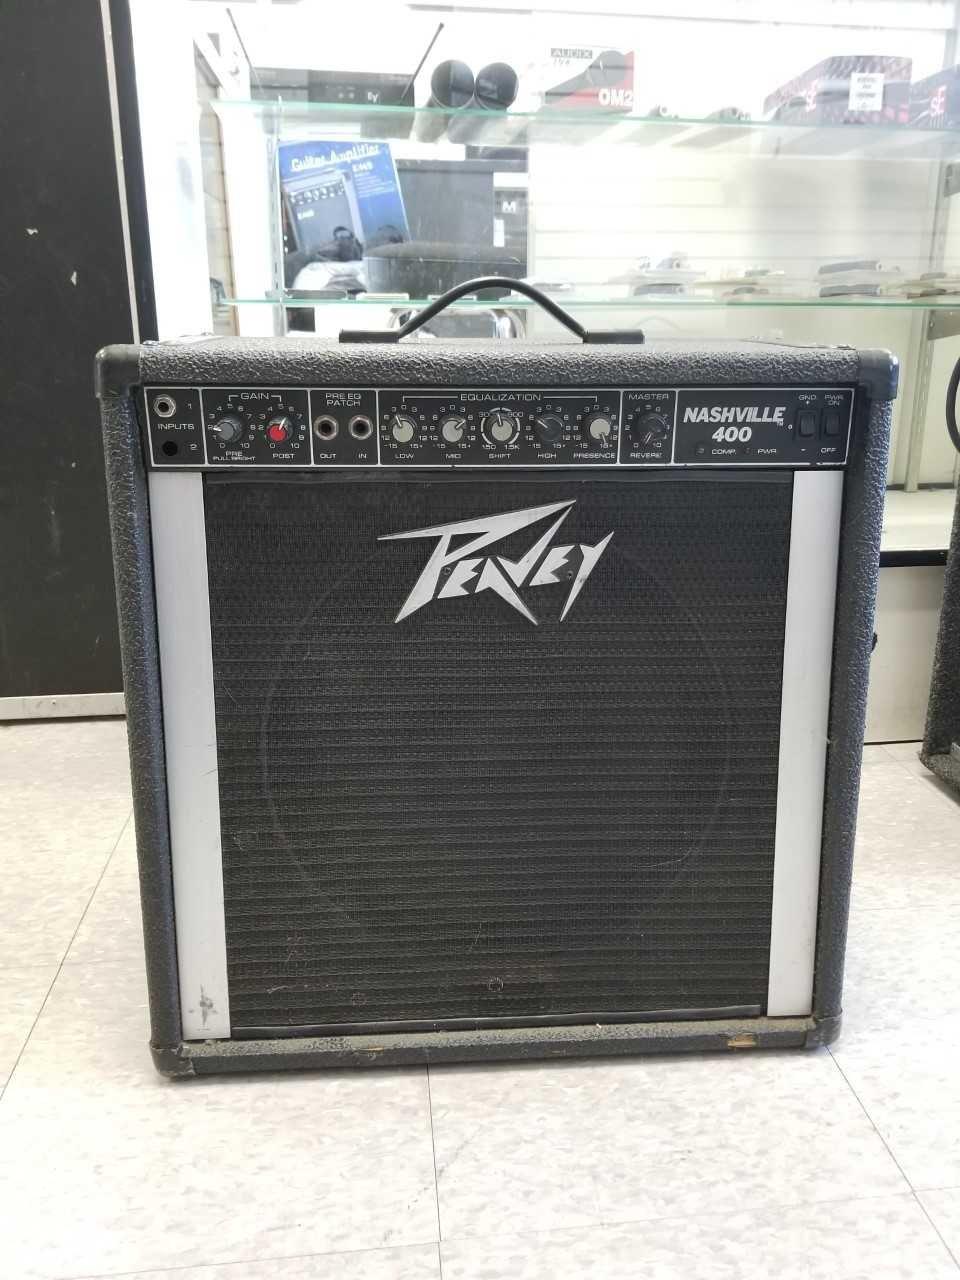 Used Peavey Nashville 400 Amp